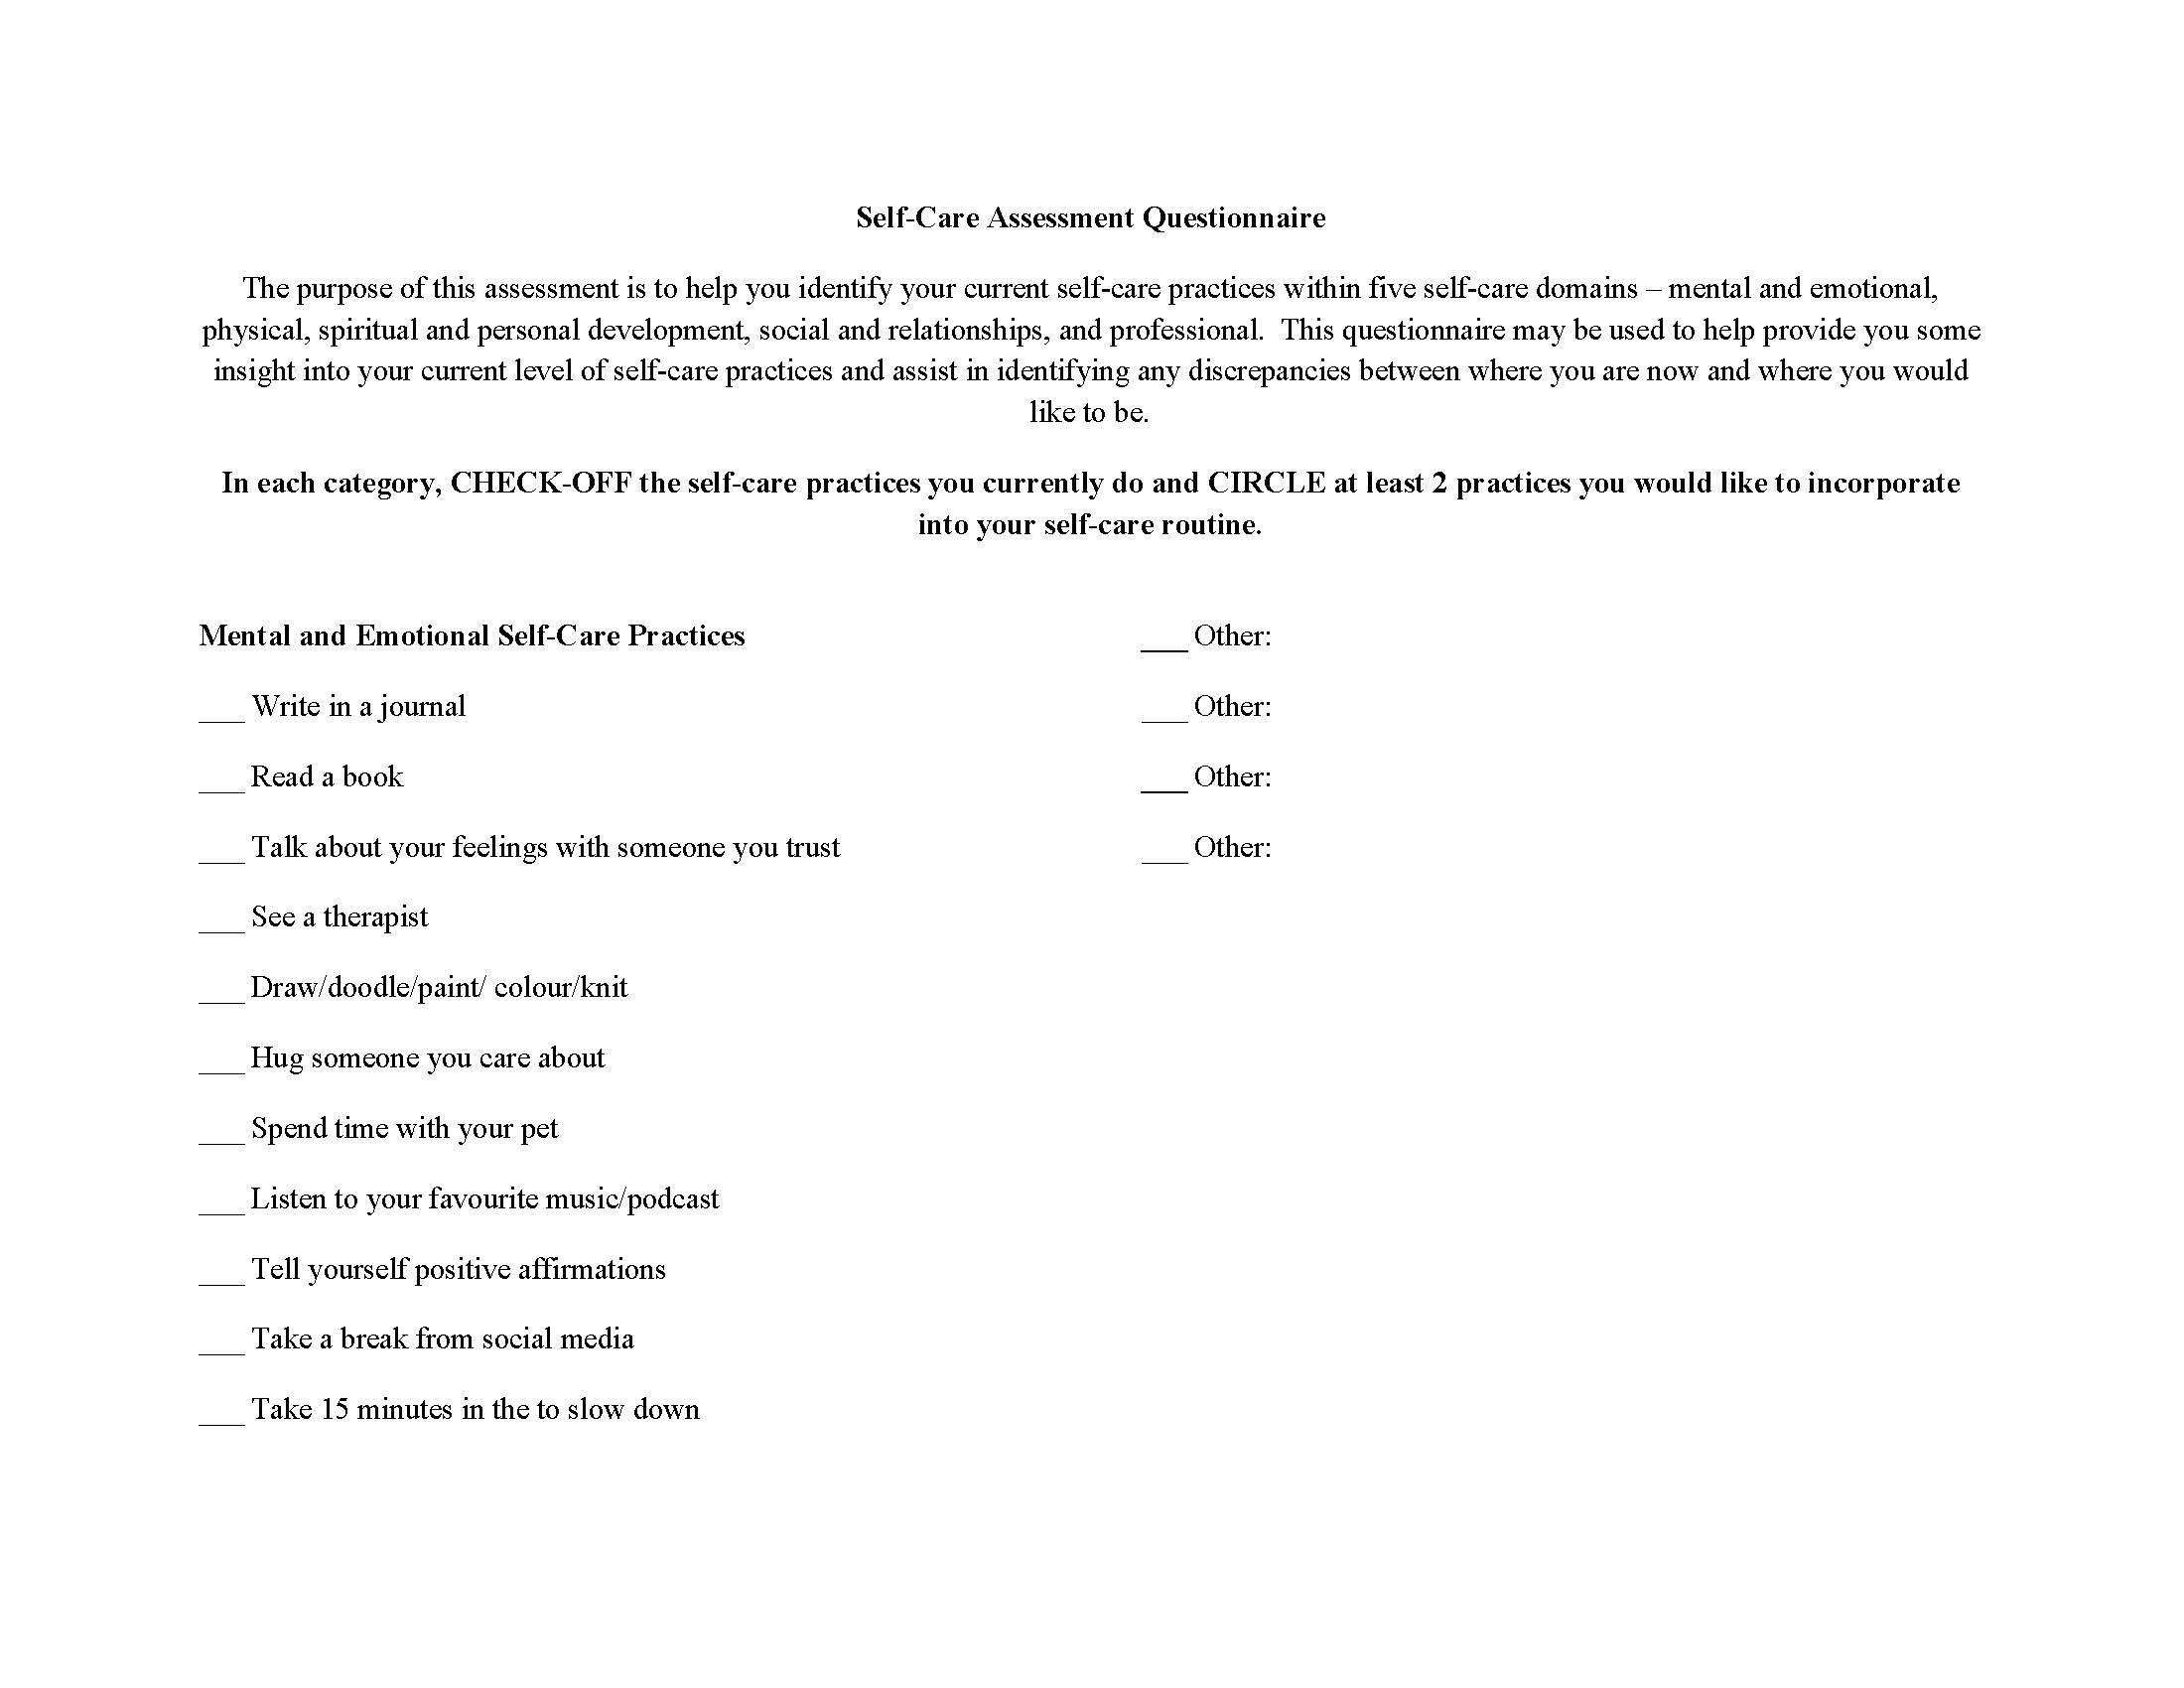 Self-Care Questionnaire